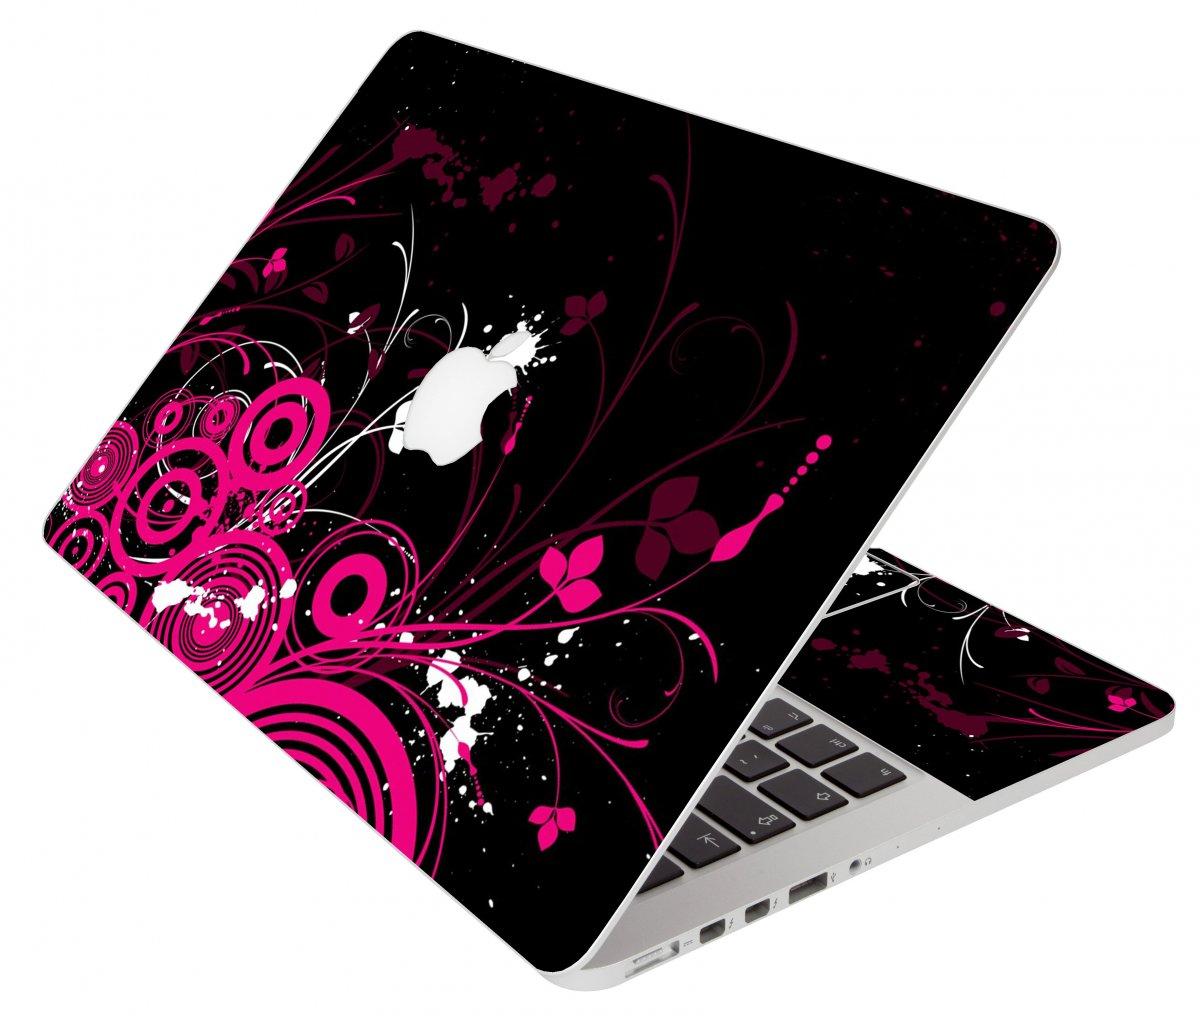 Black Pink Butterfly Apple Macbook Pro 17 A1297 Laptop